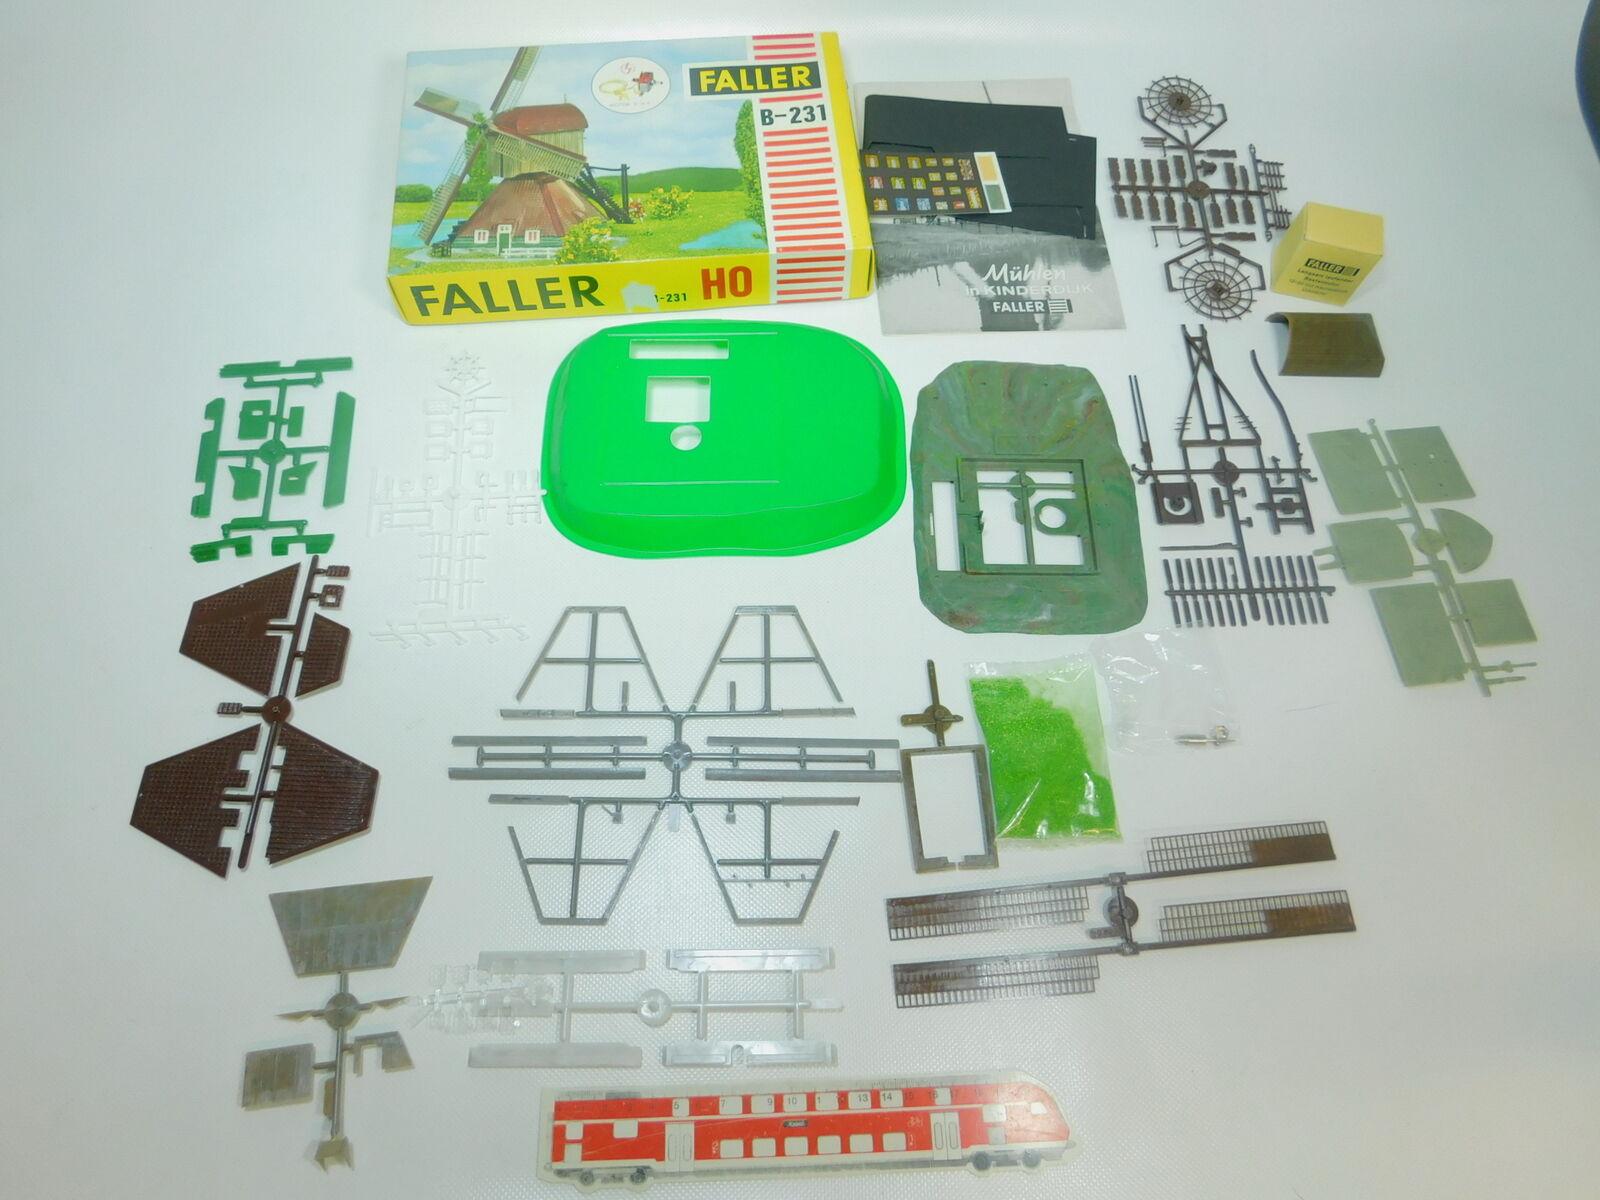 Bp372 - 1 35š averer H0 B B B - 231 Kit molinos de viento neerlandeses; 1 pequeña empresa d4d